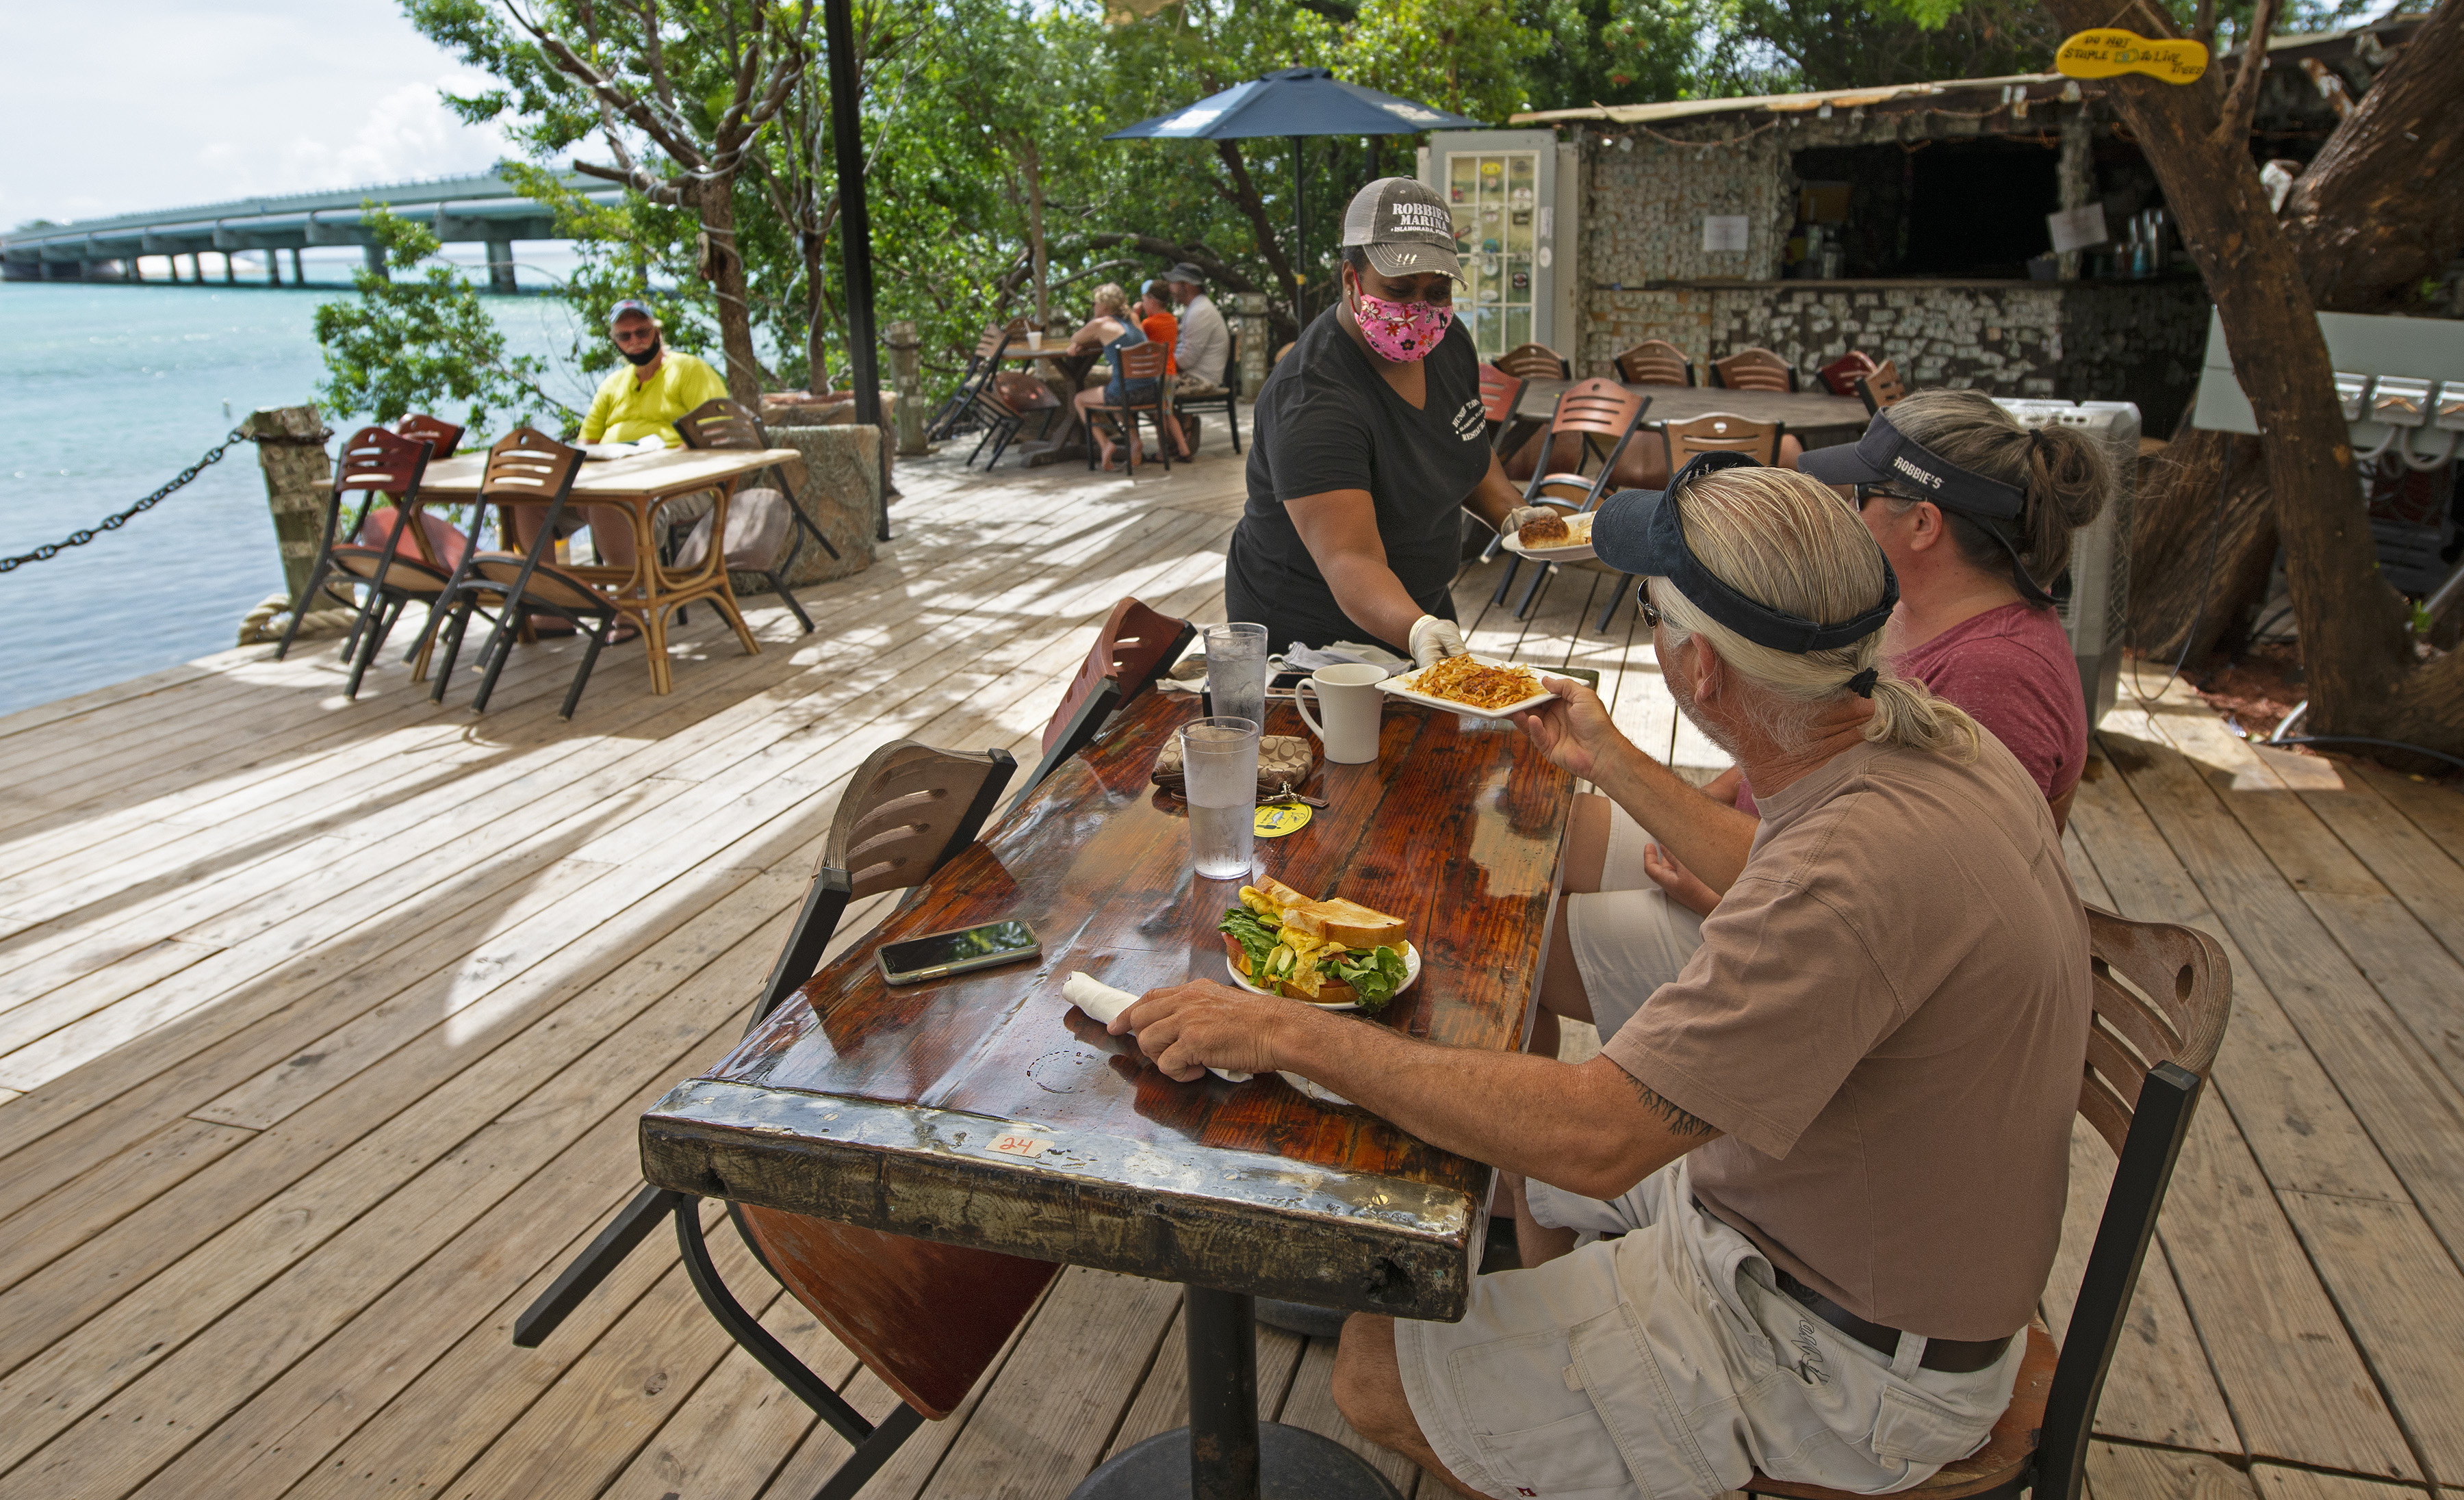 Patrons at a Florida Keys restaurant